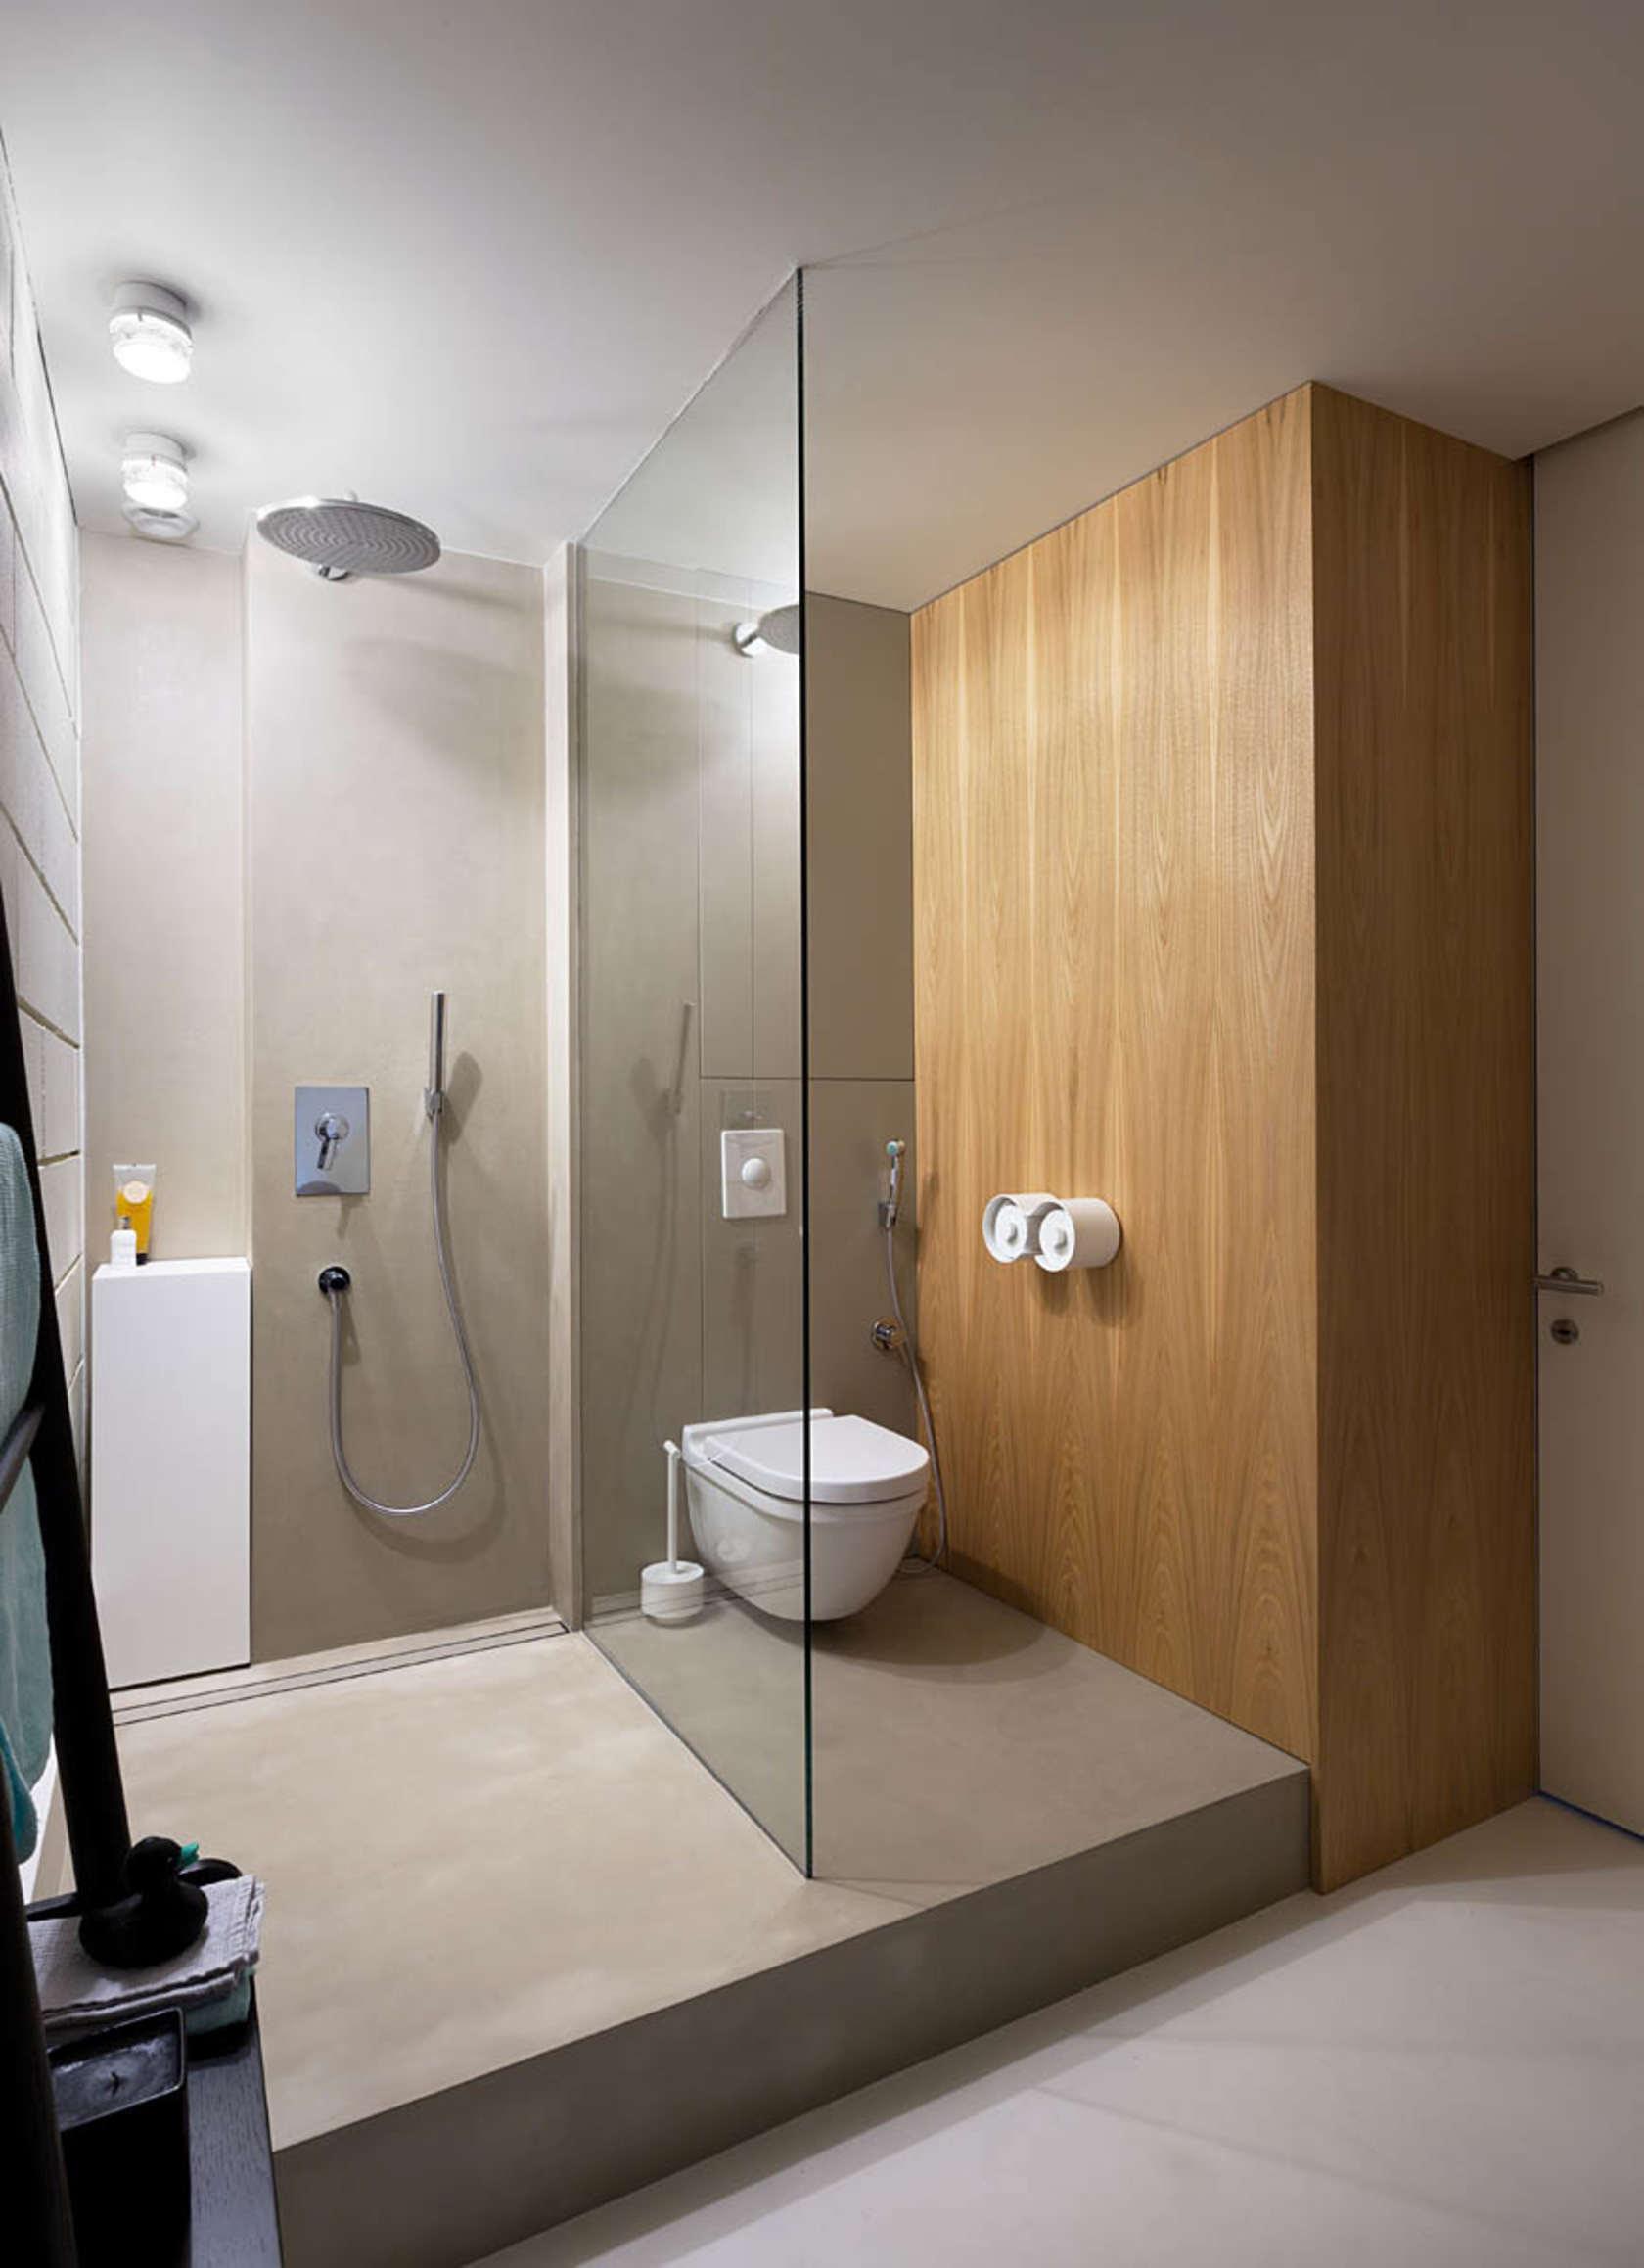 25 Beautiful Warm Bathroom Design Ideas - Decoration Love